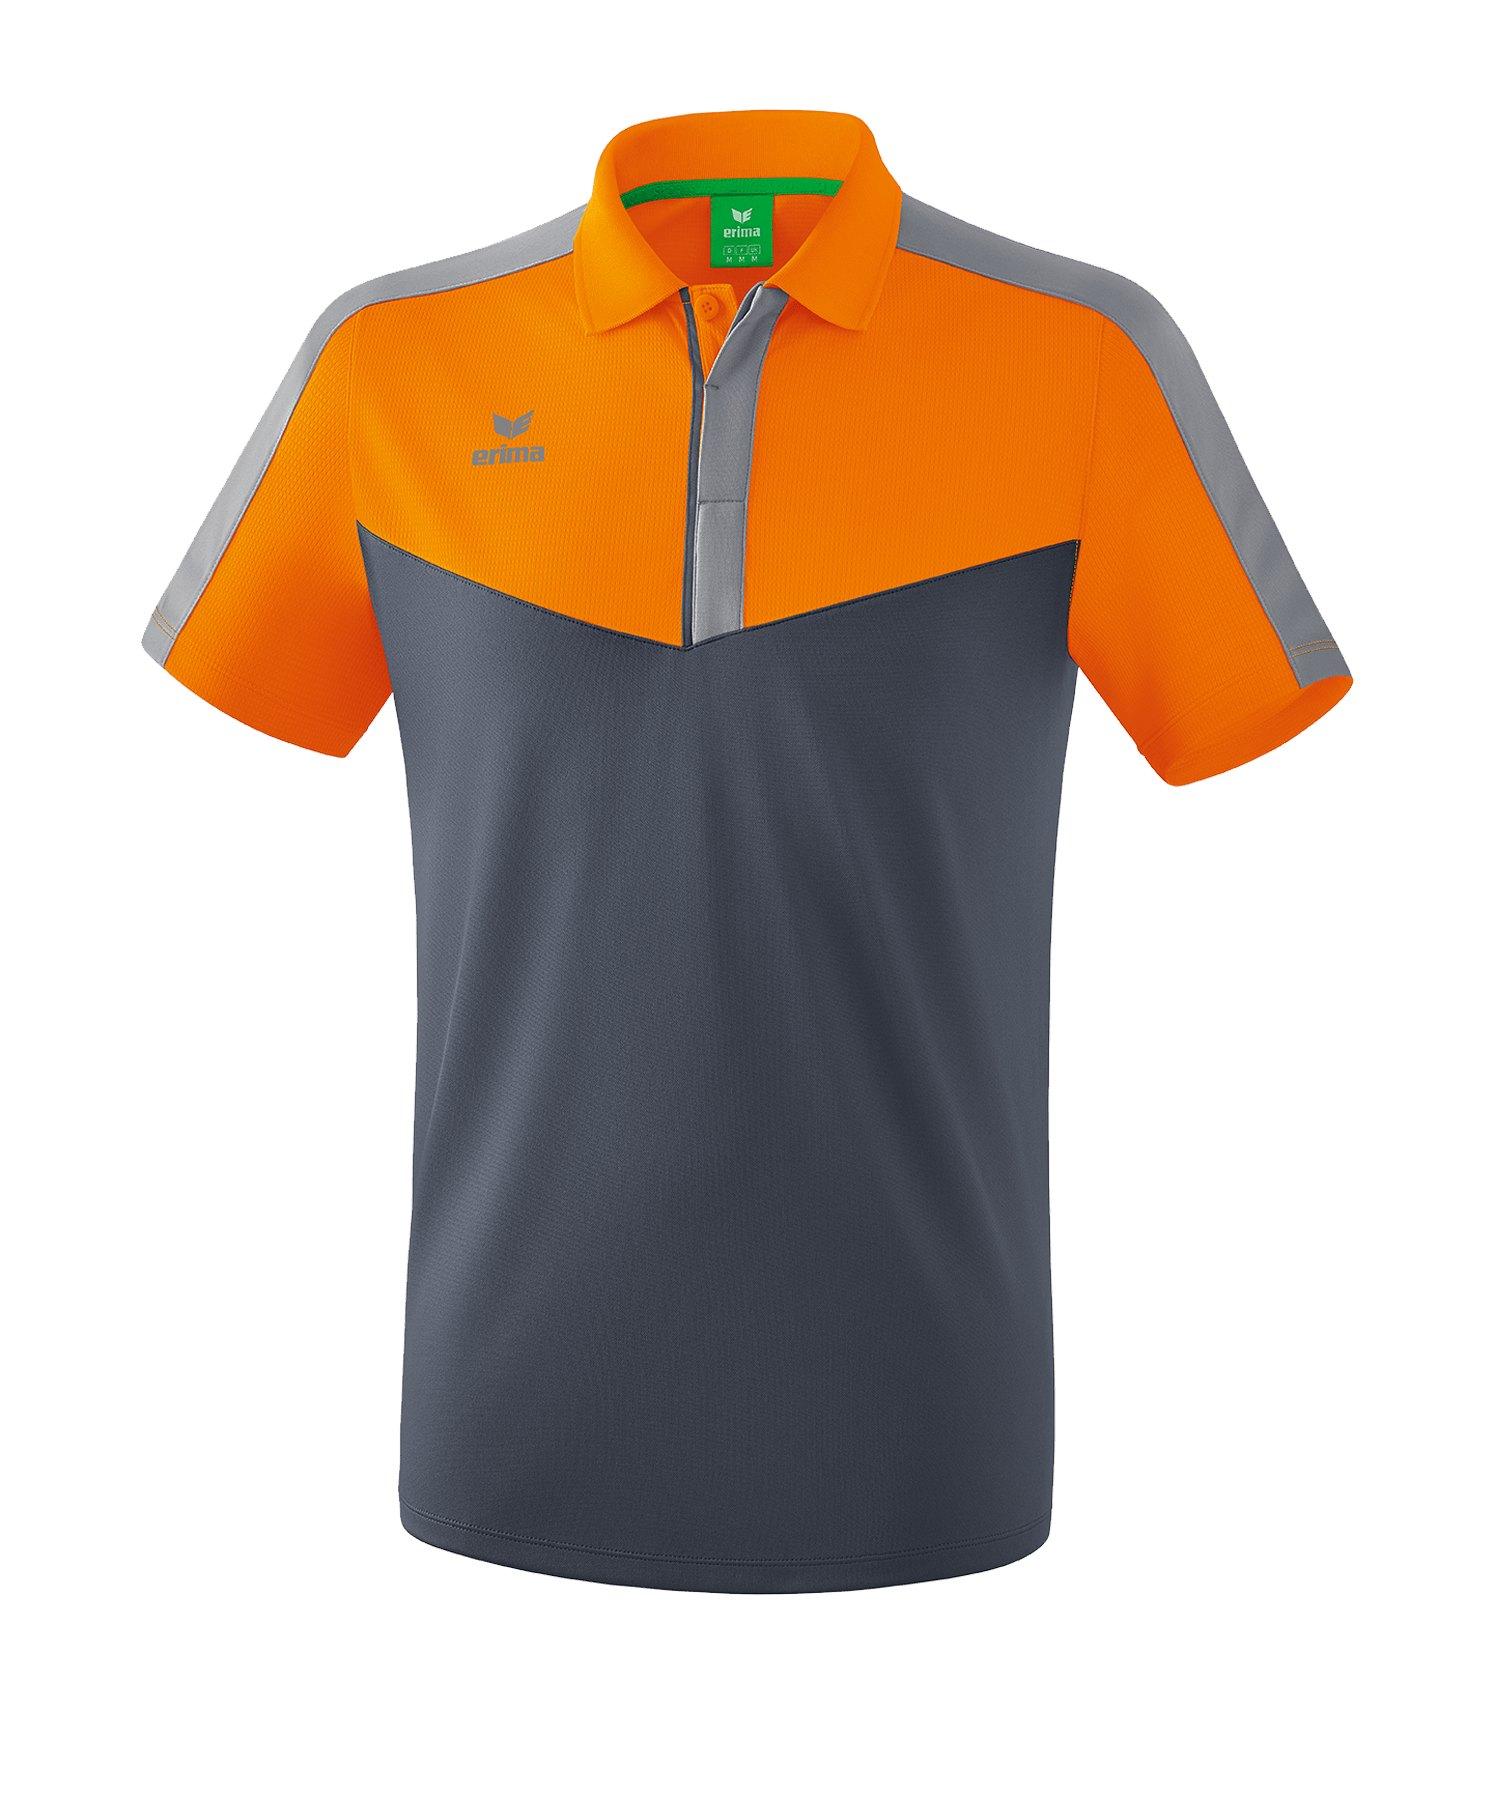 Erima Squad Poloshirt Orange Grau - orange